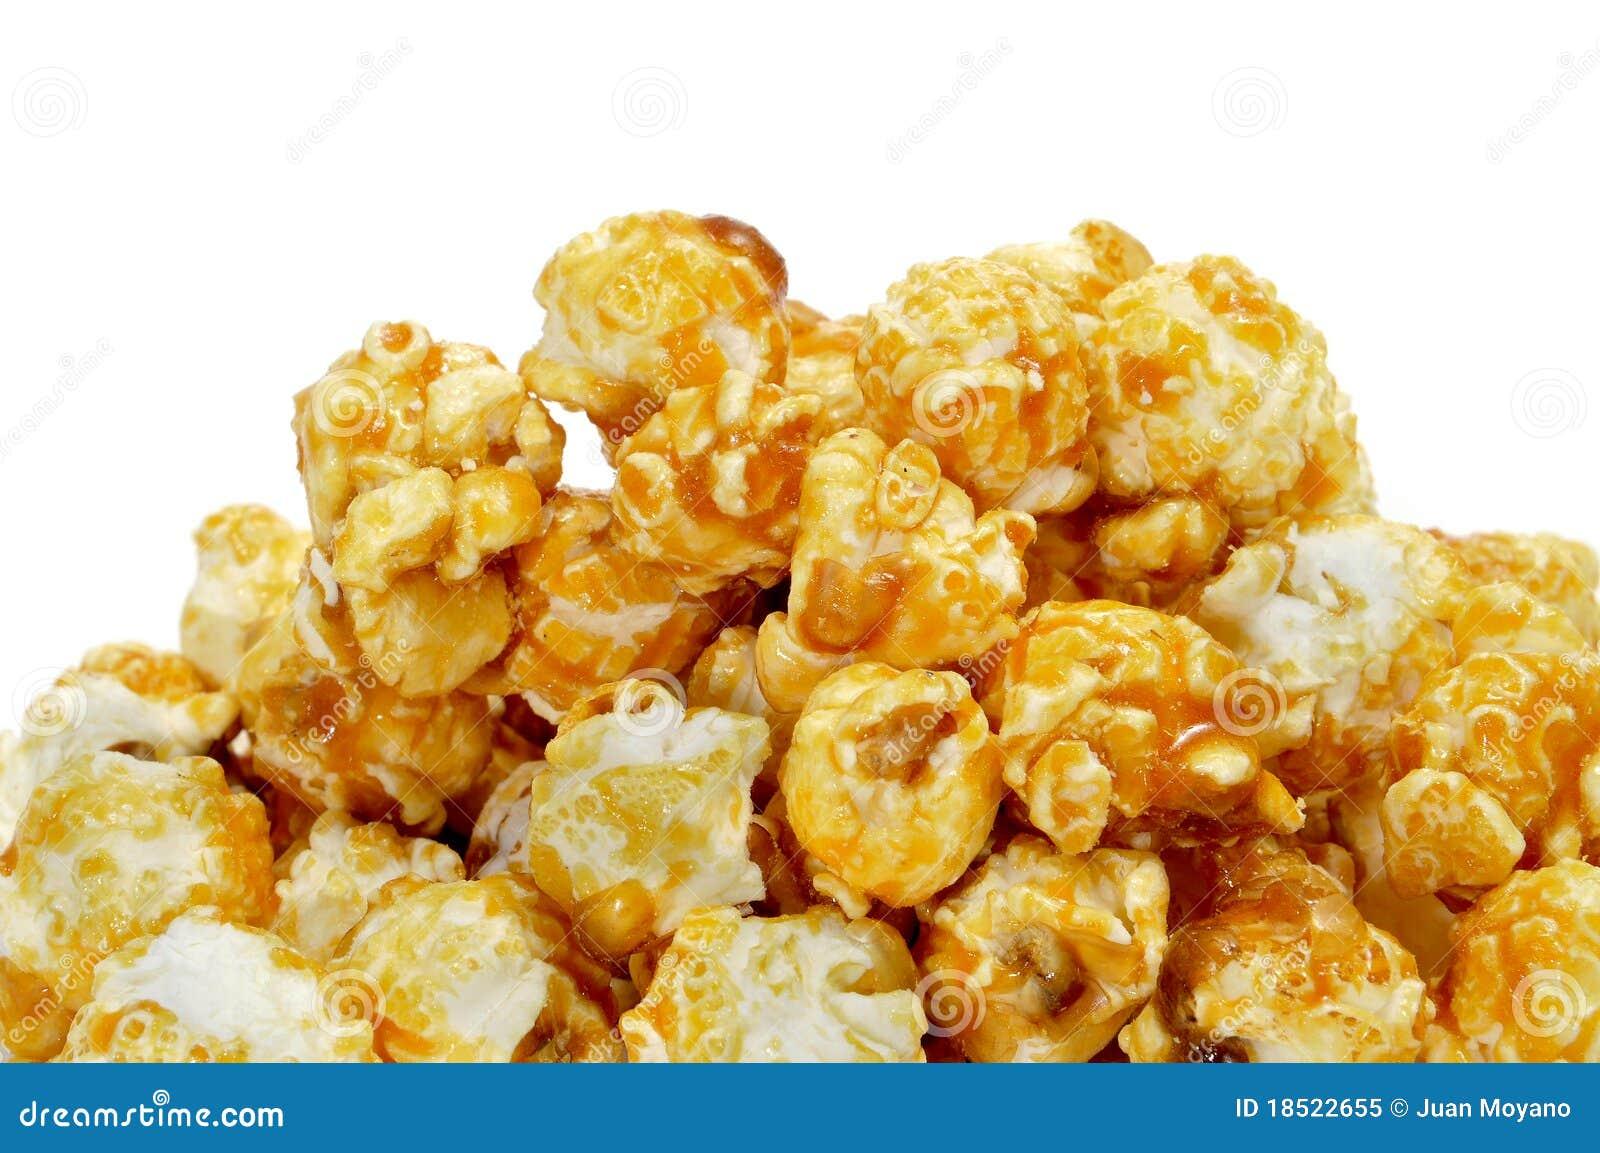 Caramel Corn Royalty Free Stock Photo - Image: 18522655